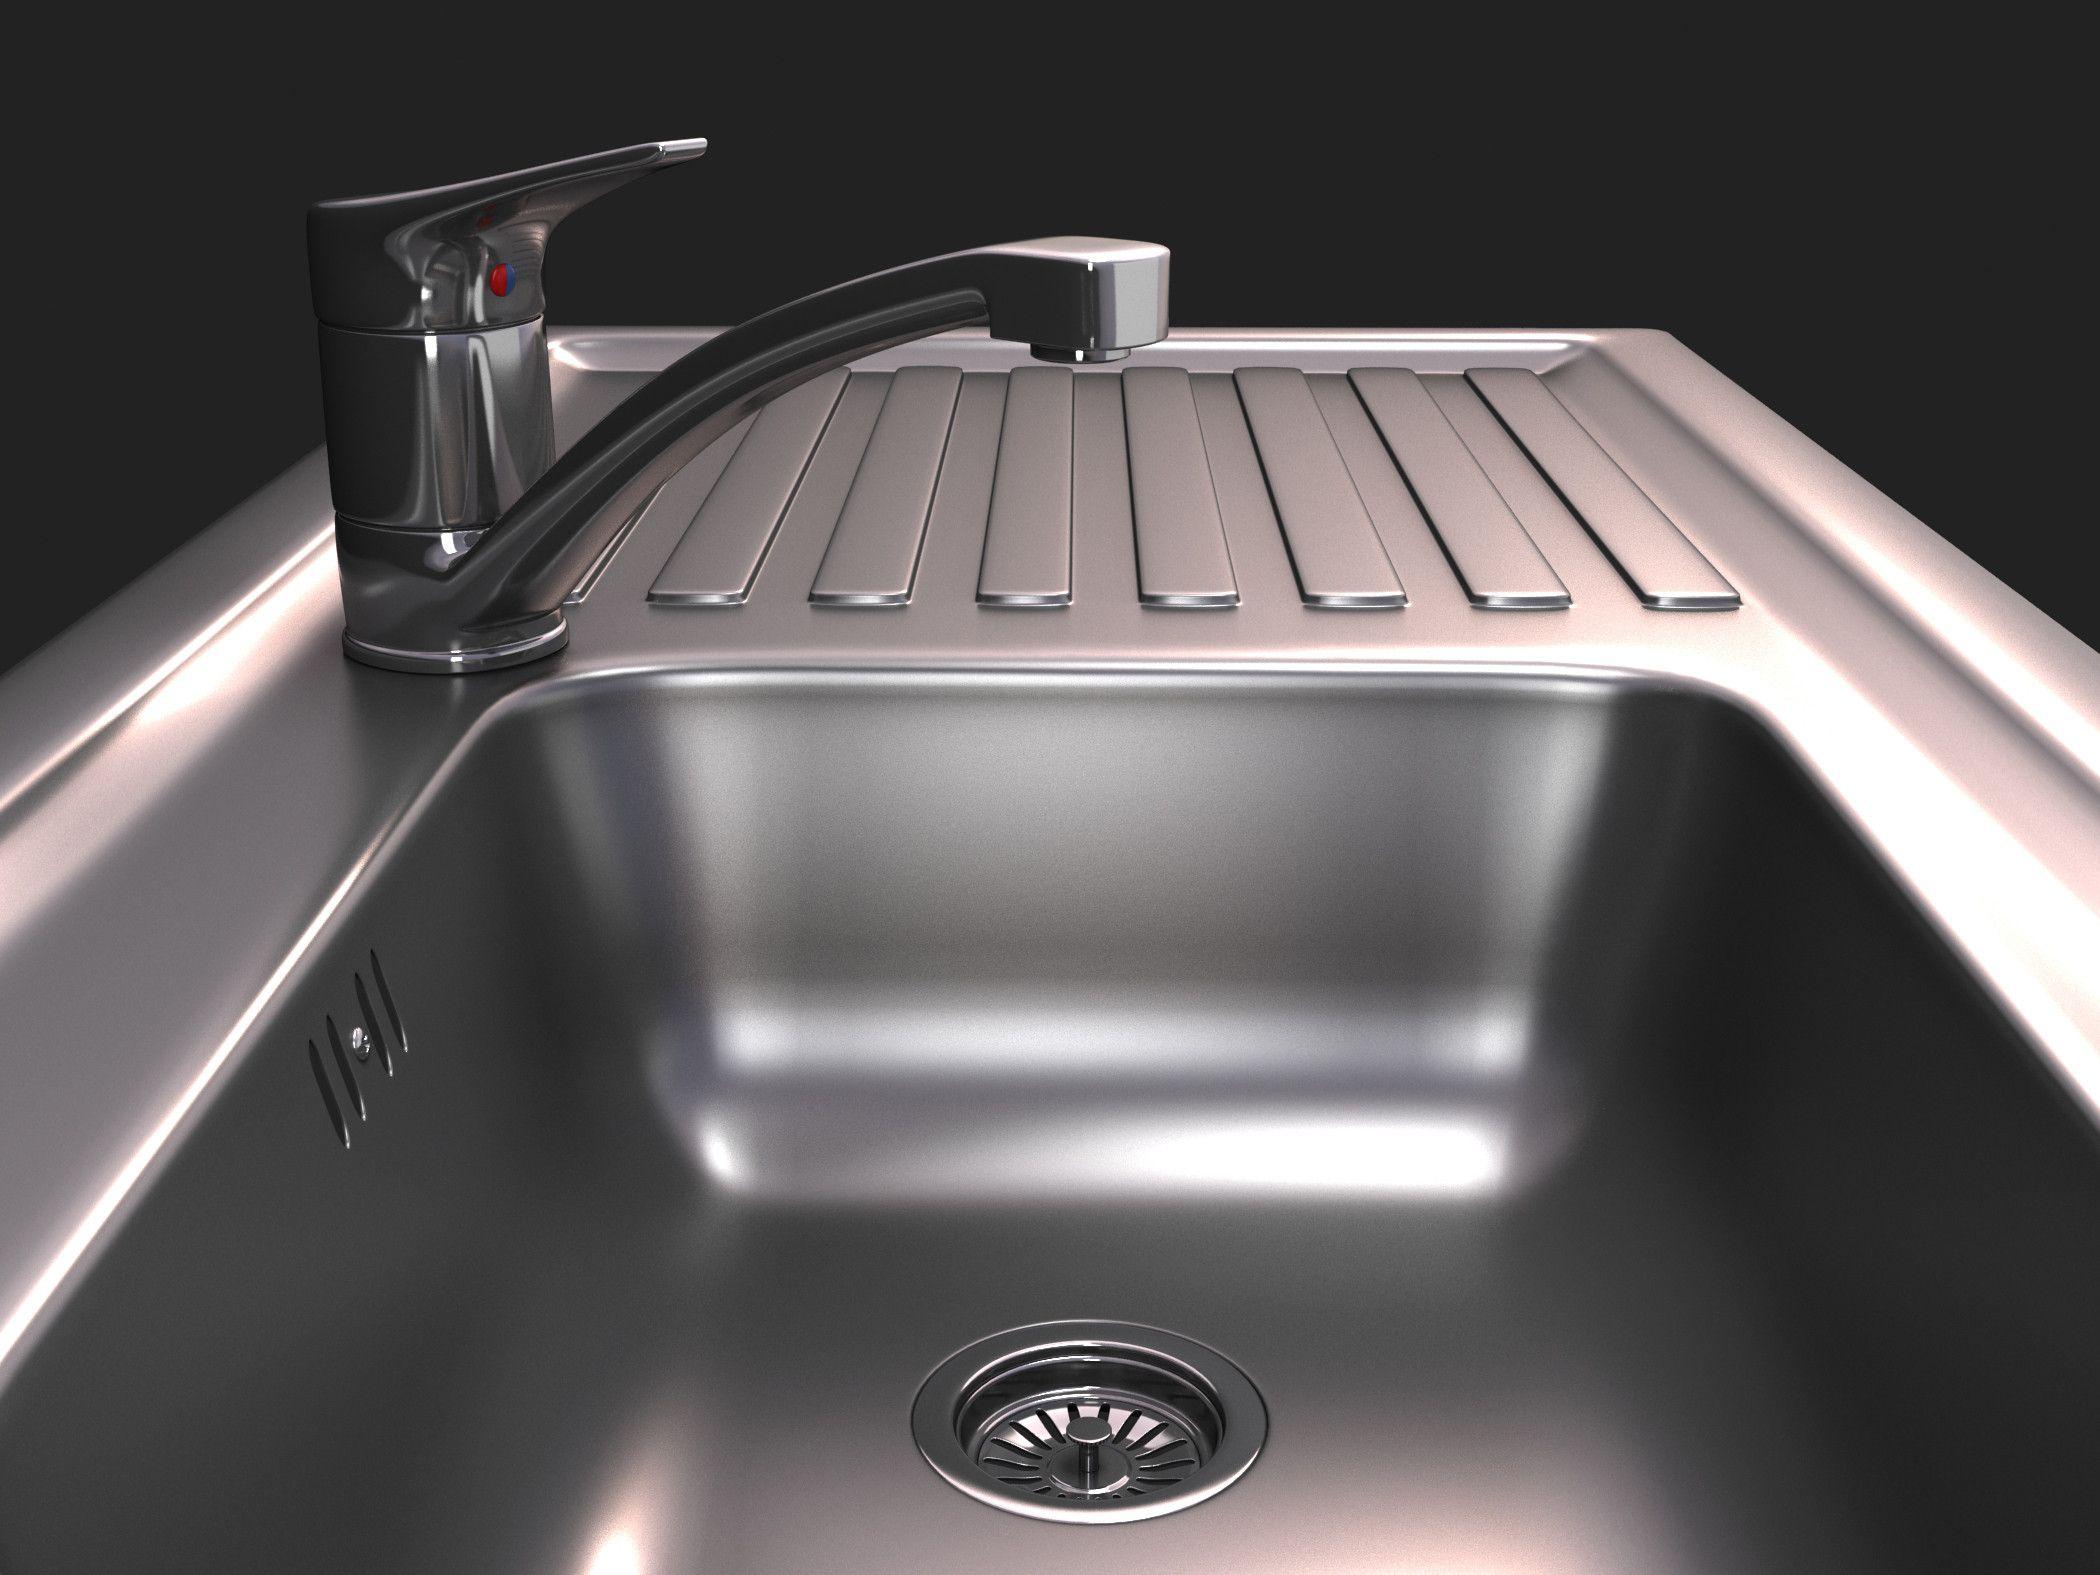 Sink Tap Modell : Kitchen sink tap max d model modeling